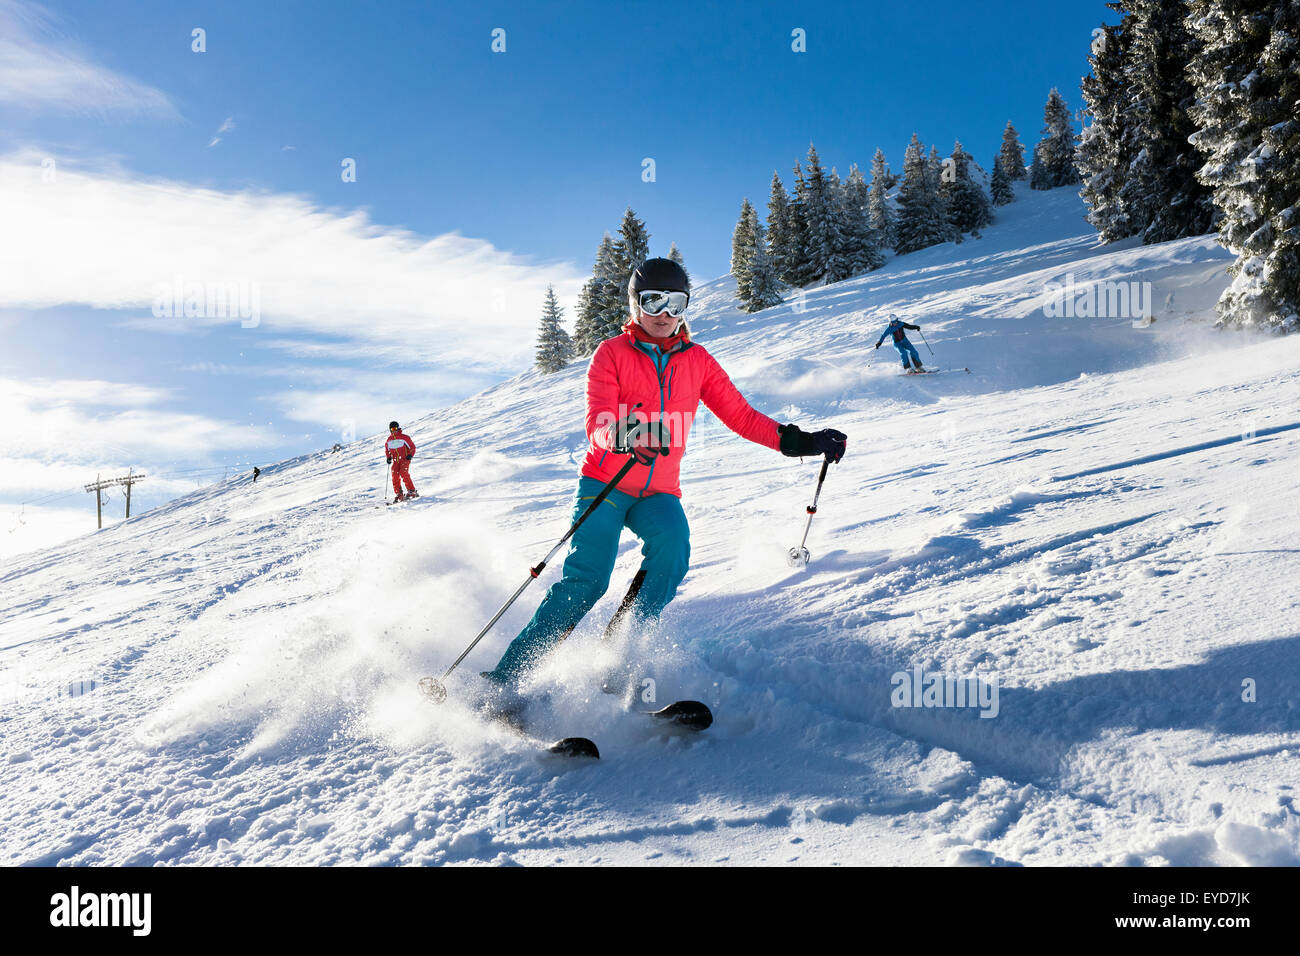 Ski holiday, Group of skiers carving downhill, Sudelfeld, Bavaria, Germany - Stock Image